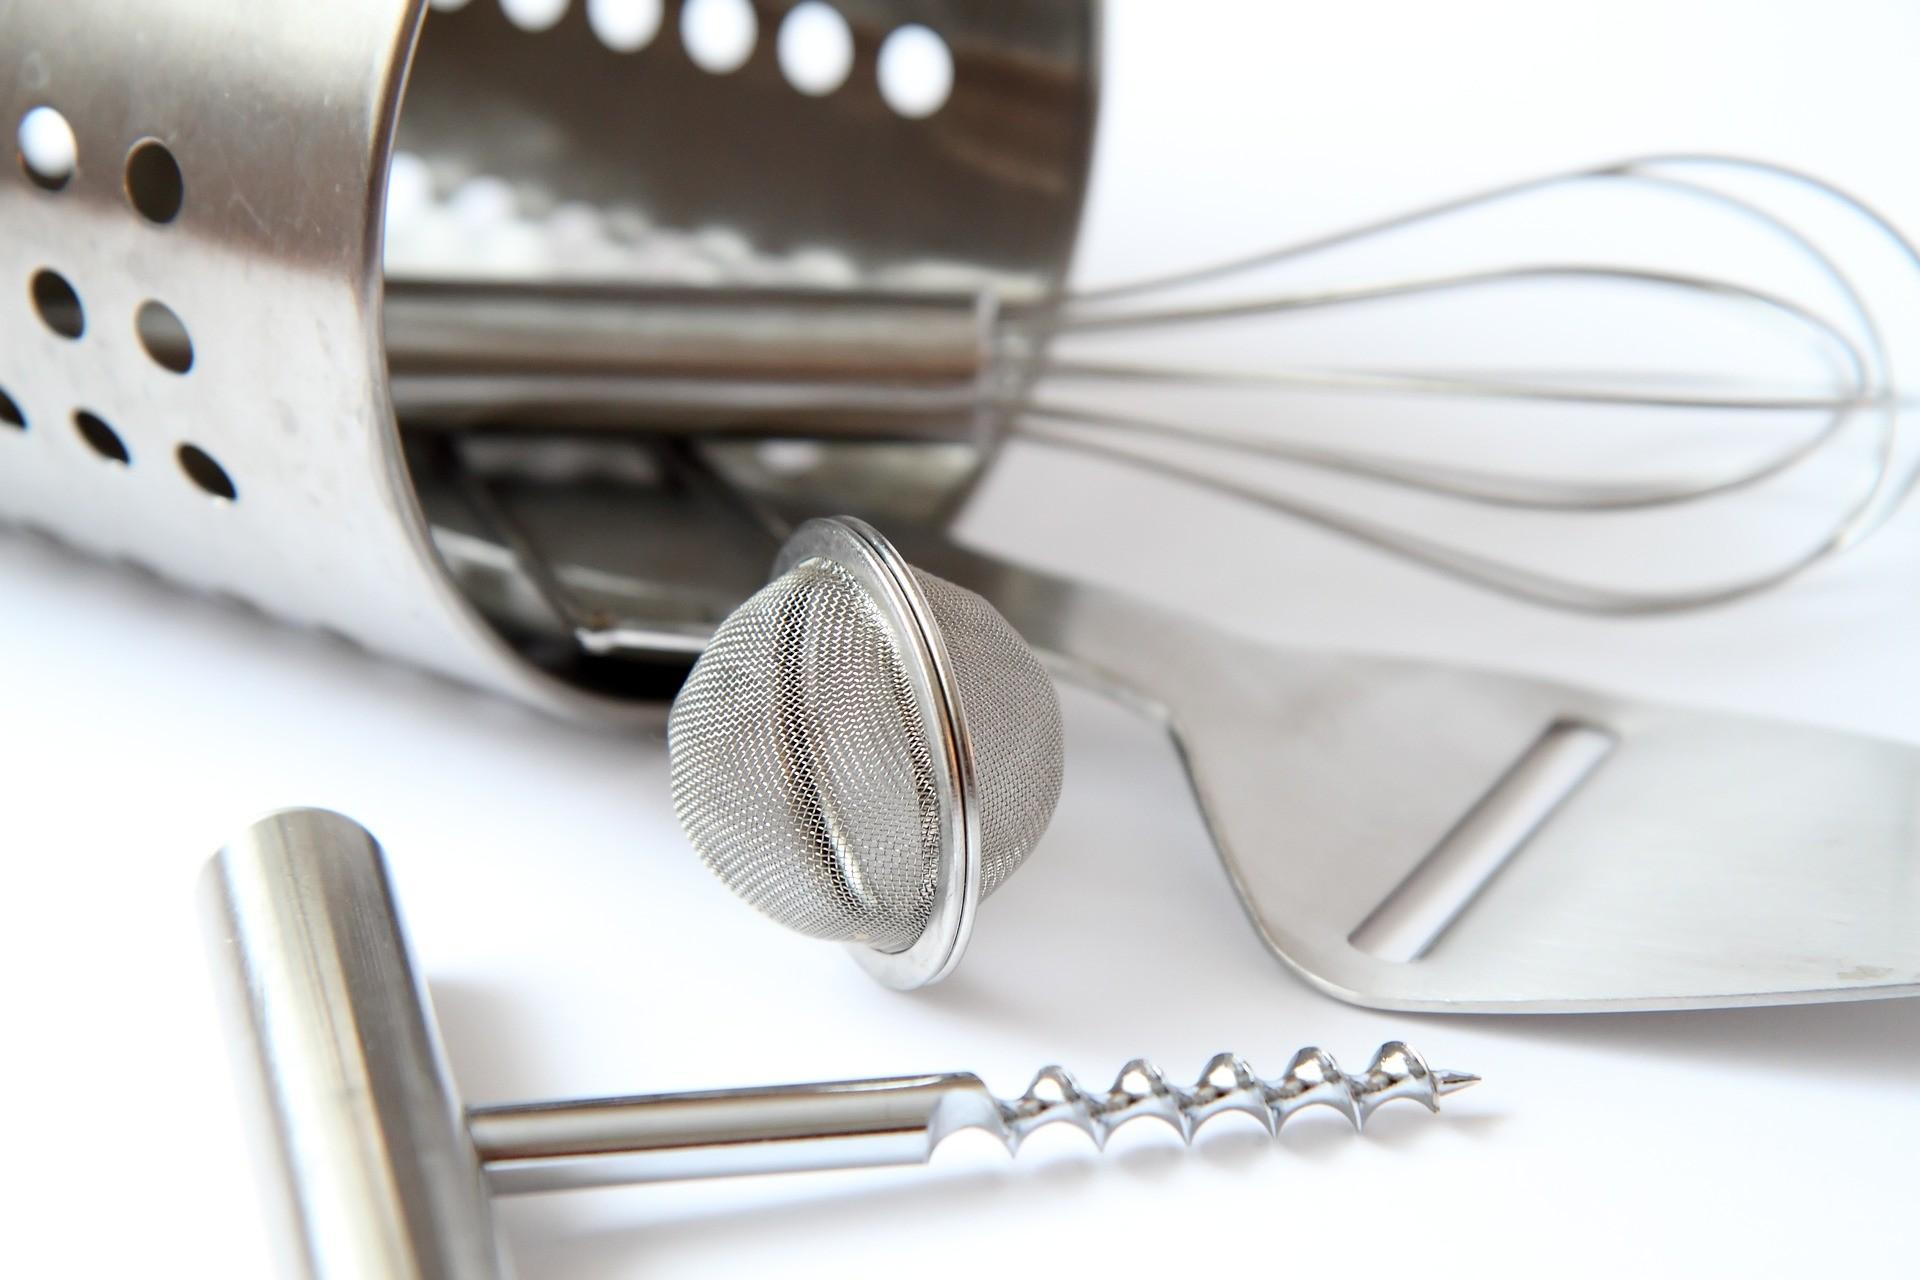 Qu es objeto definici n concepto y significado - Utensili da cucina per dolci ...